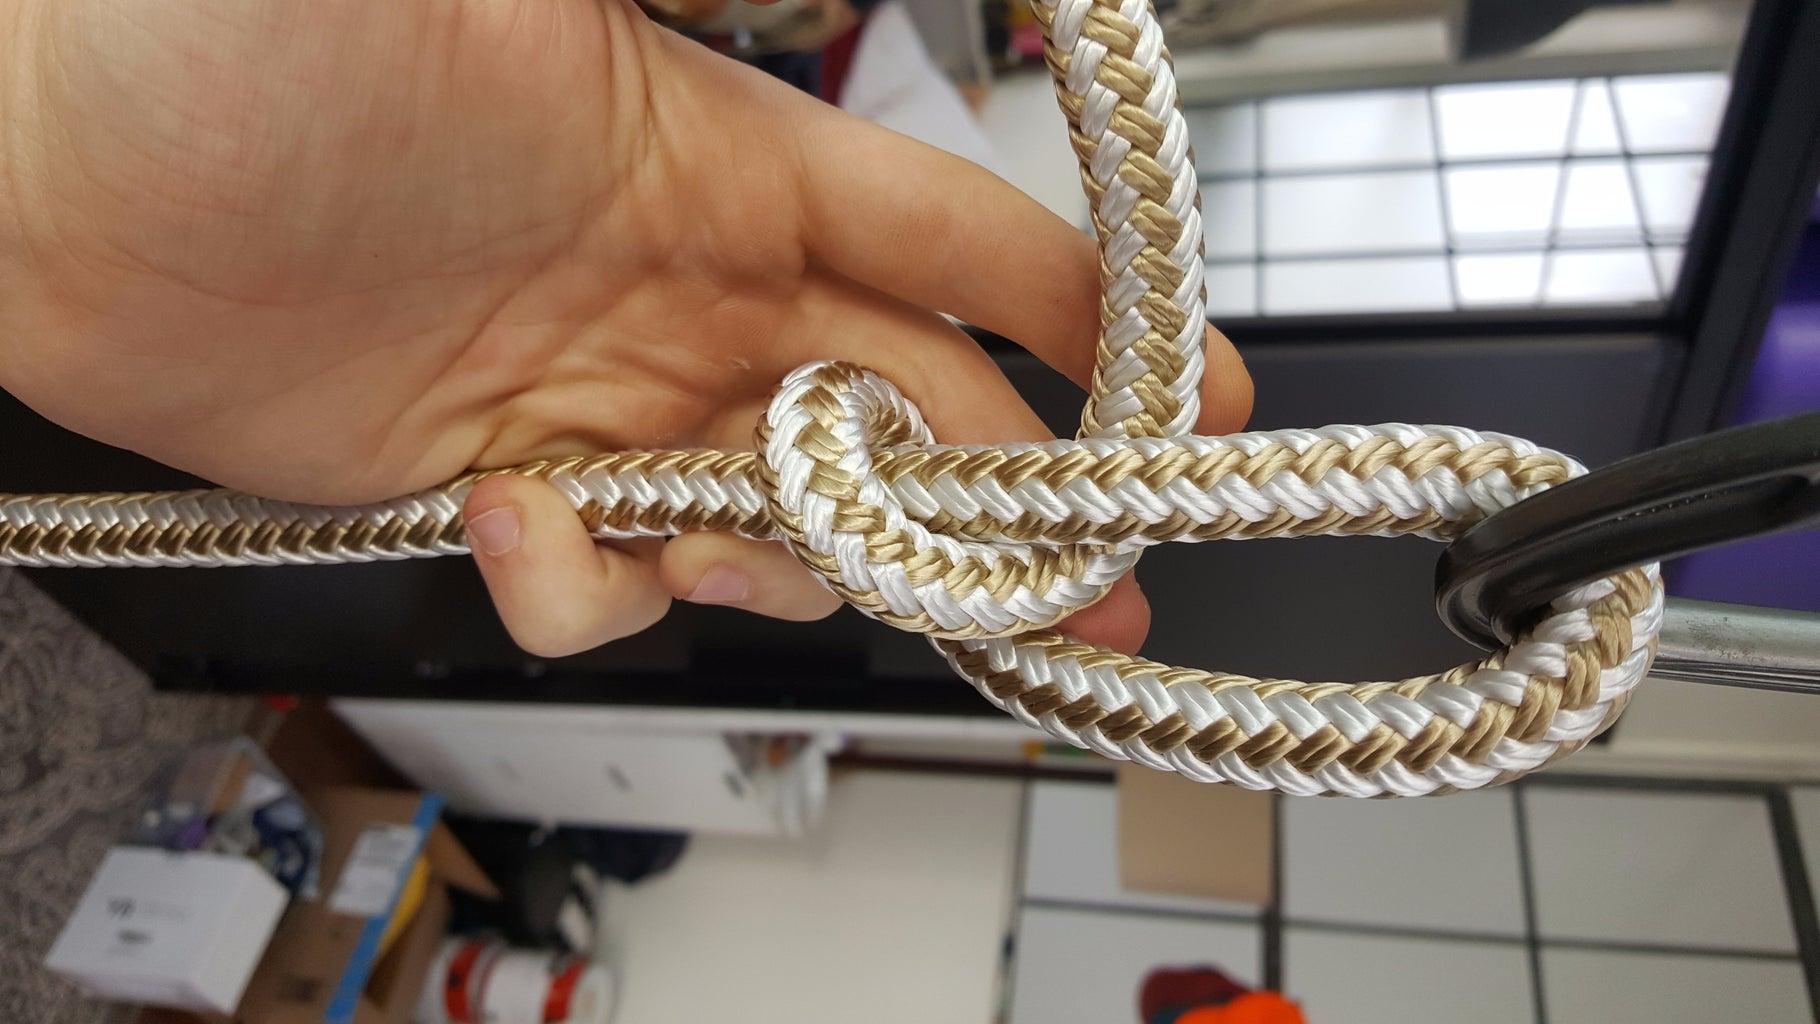 Carabener Knot